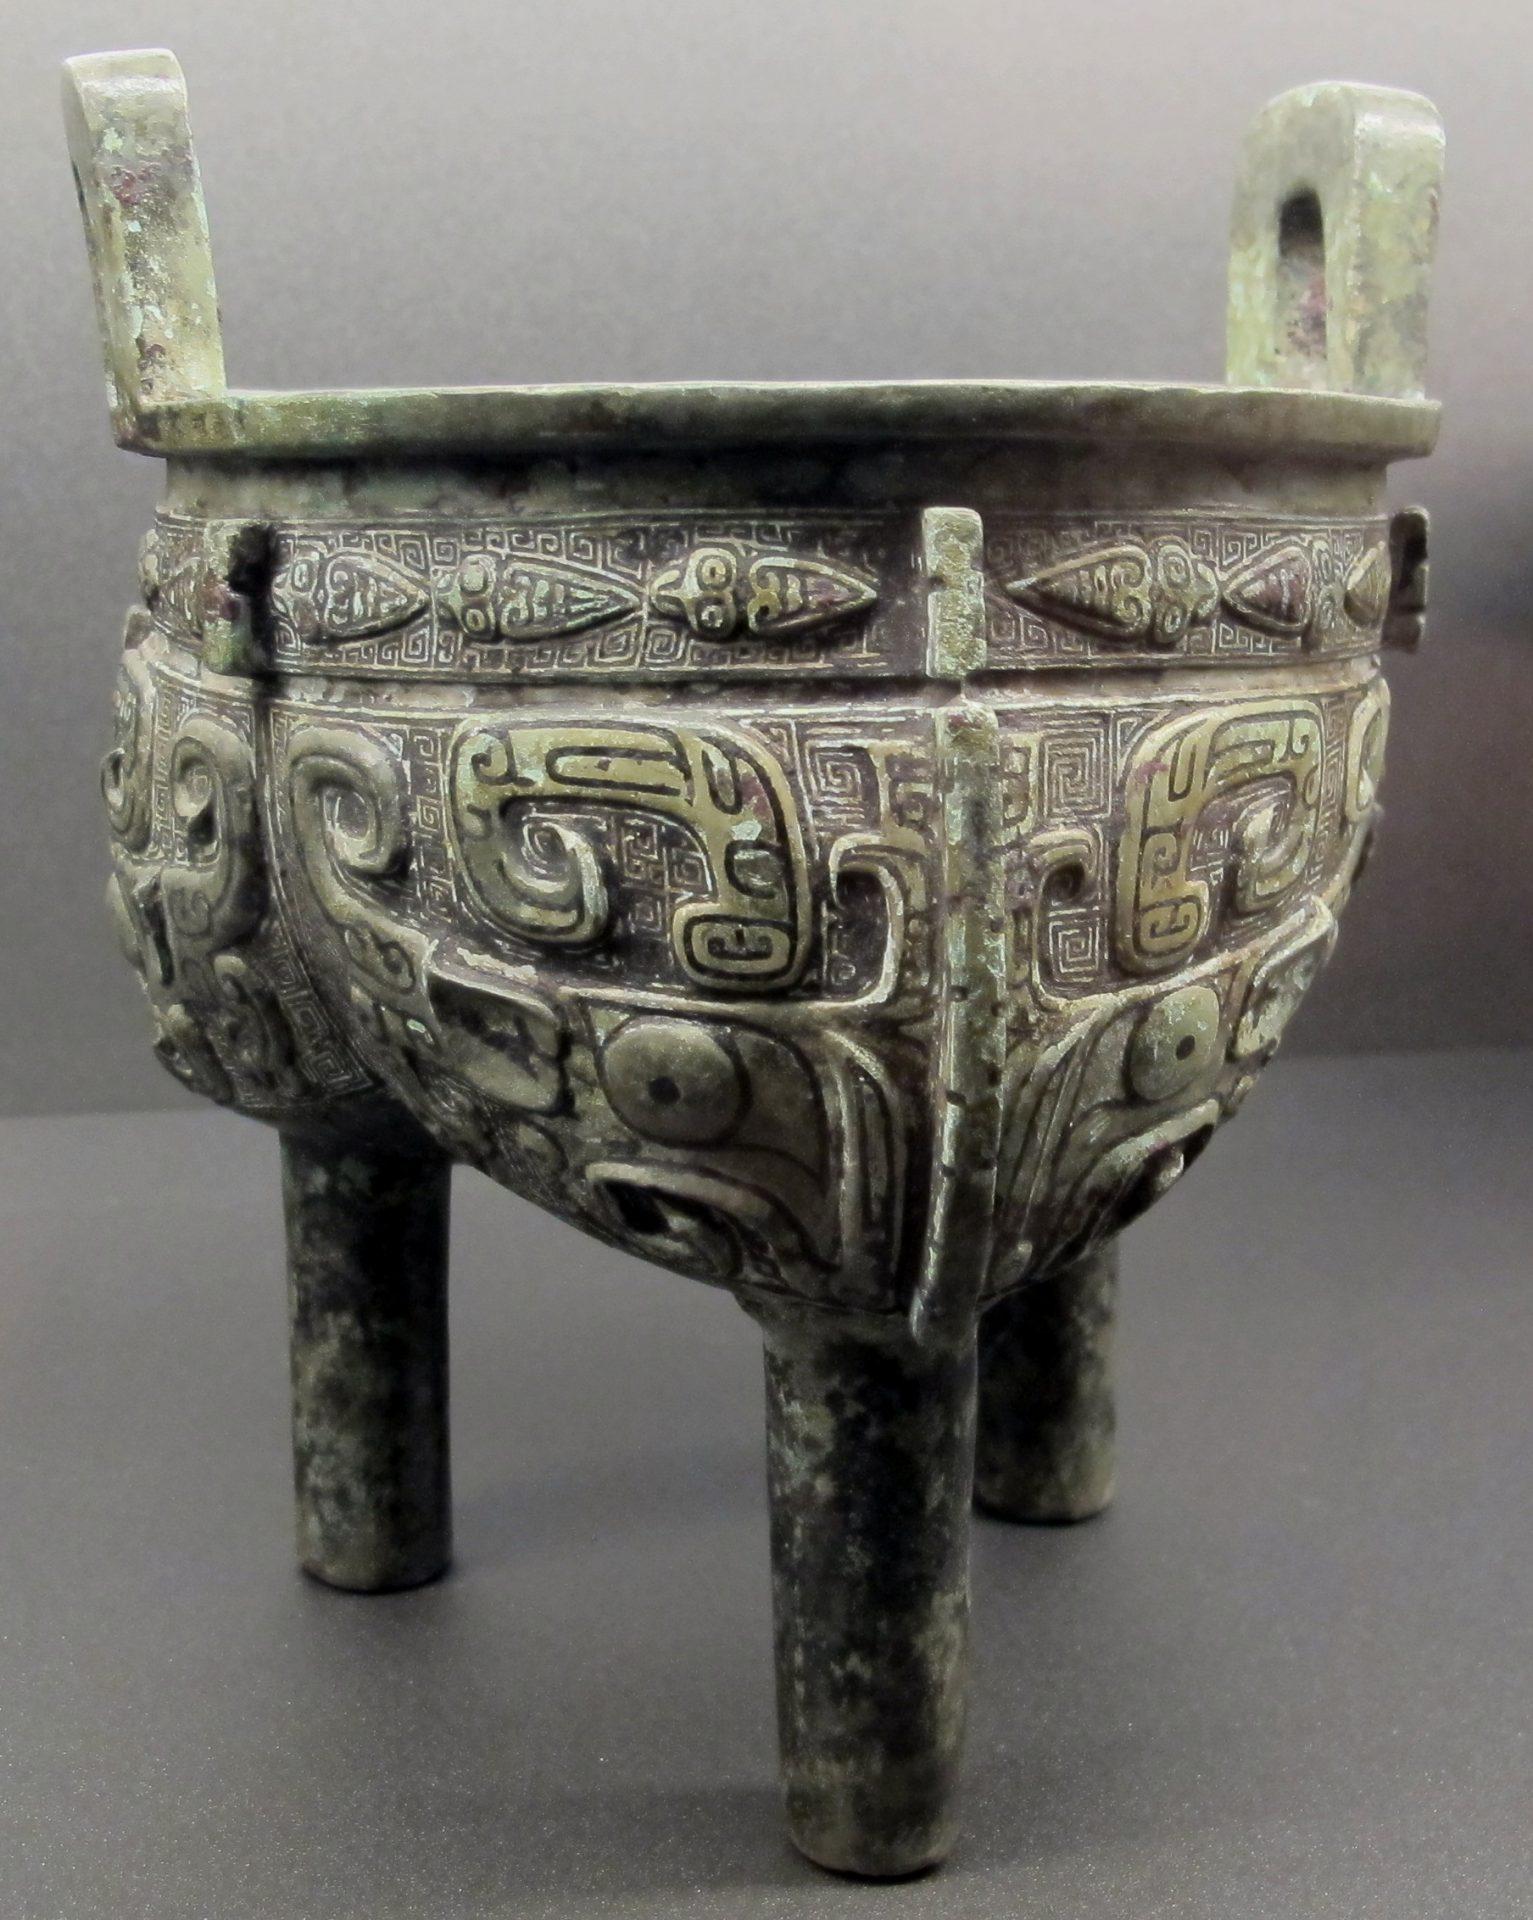 A Shang dynasty bronze ding vessel. (Image: Sailko via wikimedia CC BY-SA 3.0)